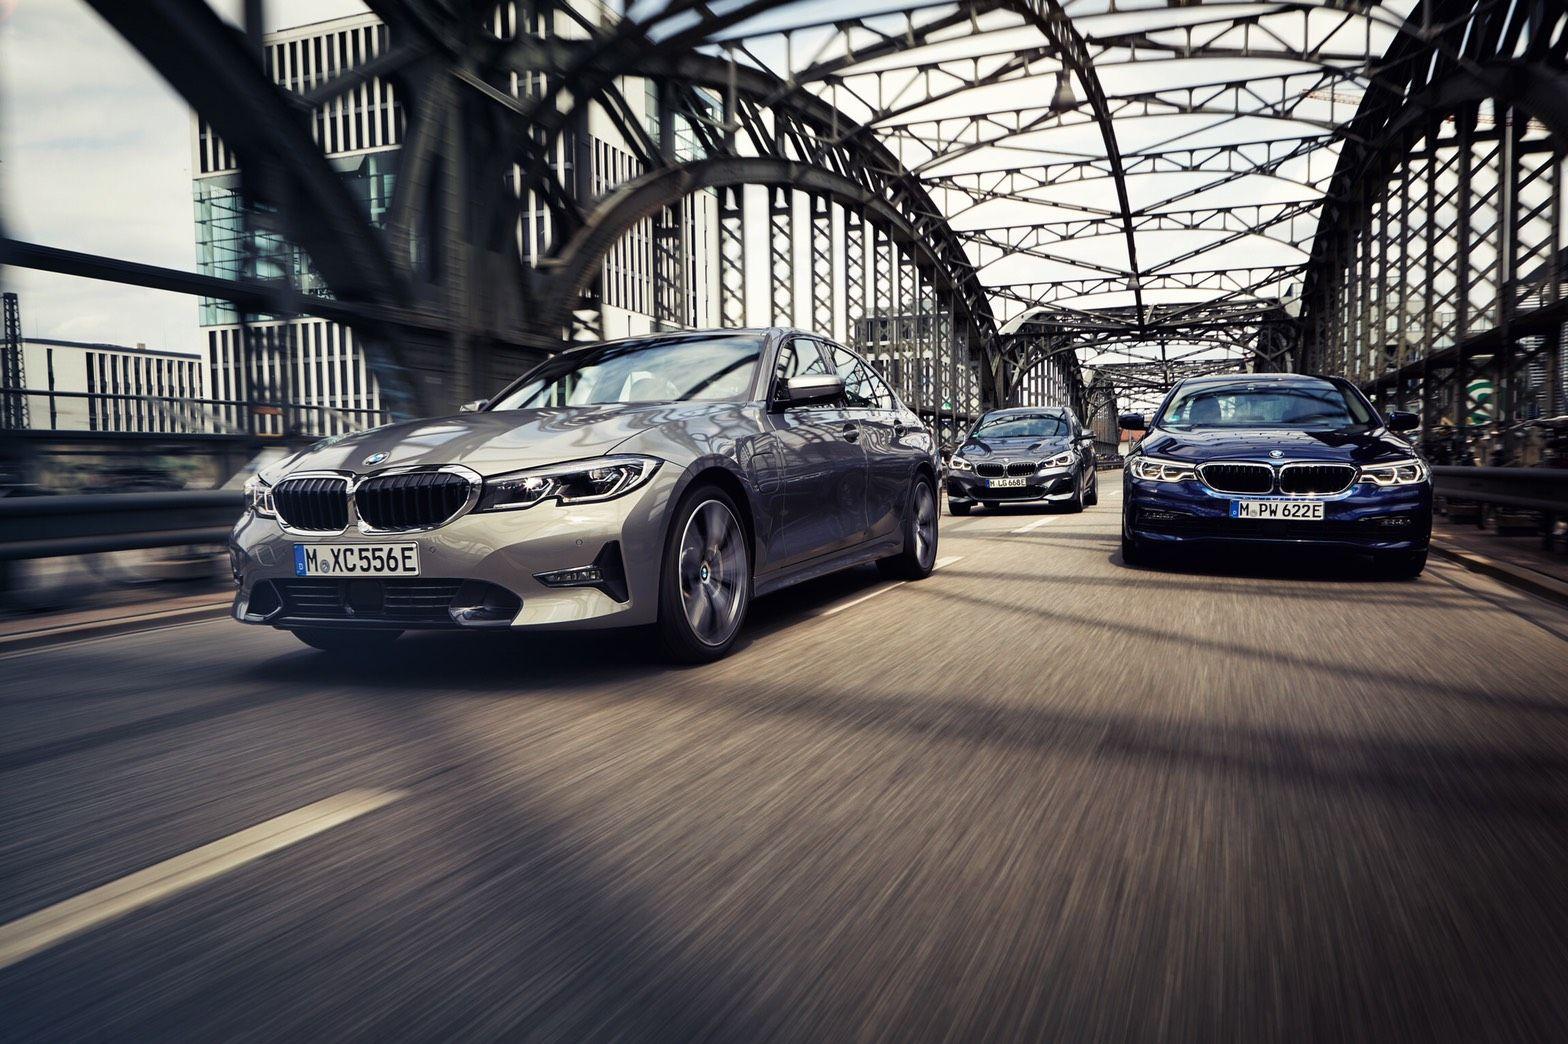 Photo: Courtesy of BMW